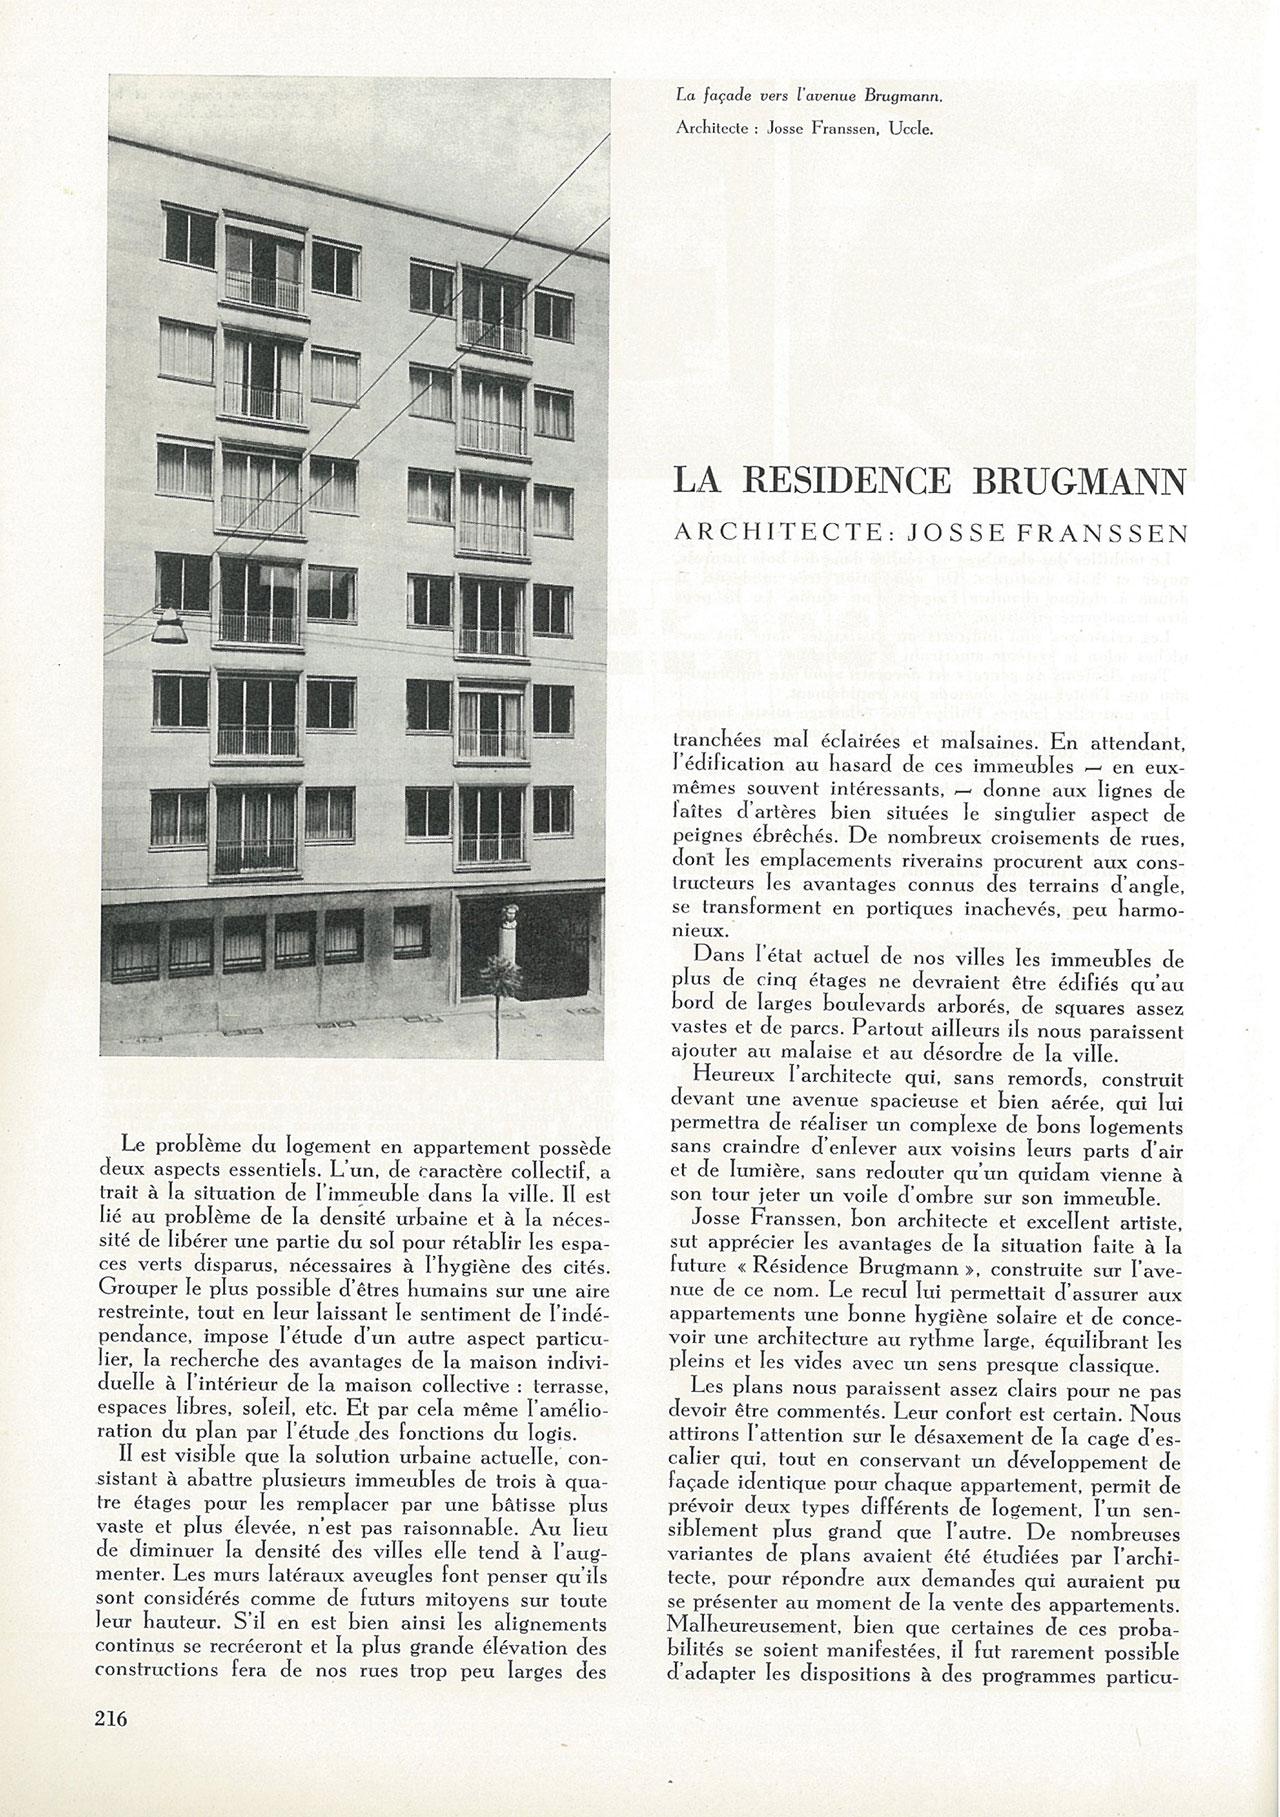 La résidence Brugmann